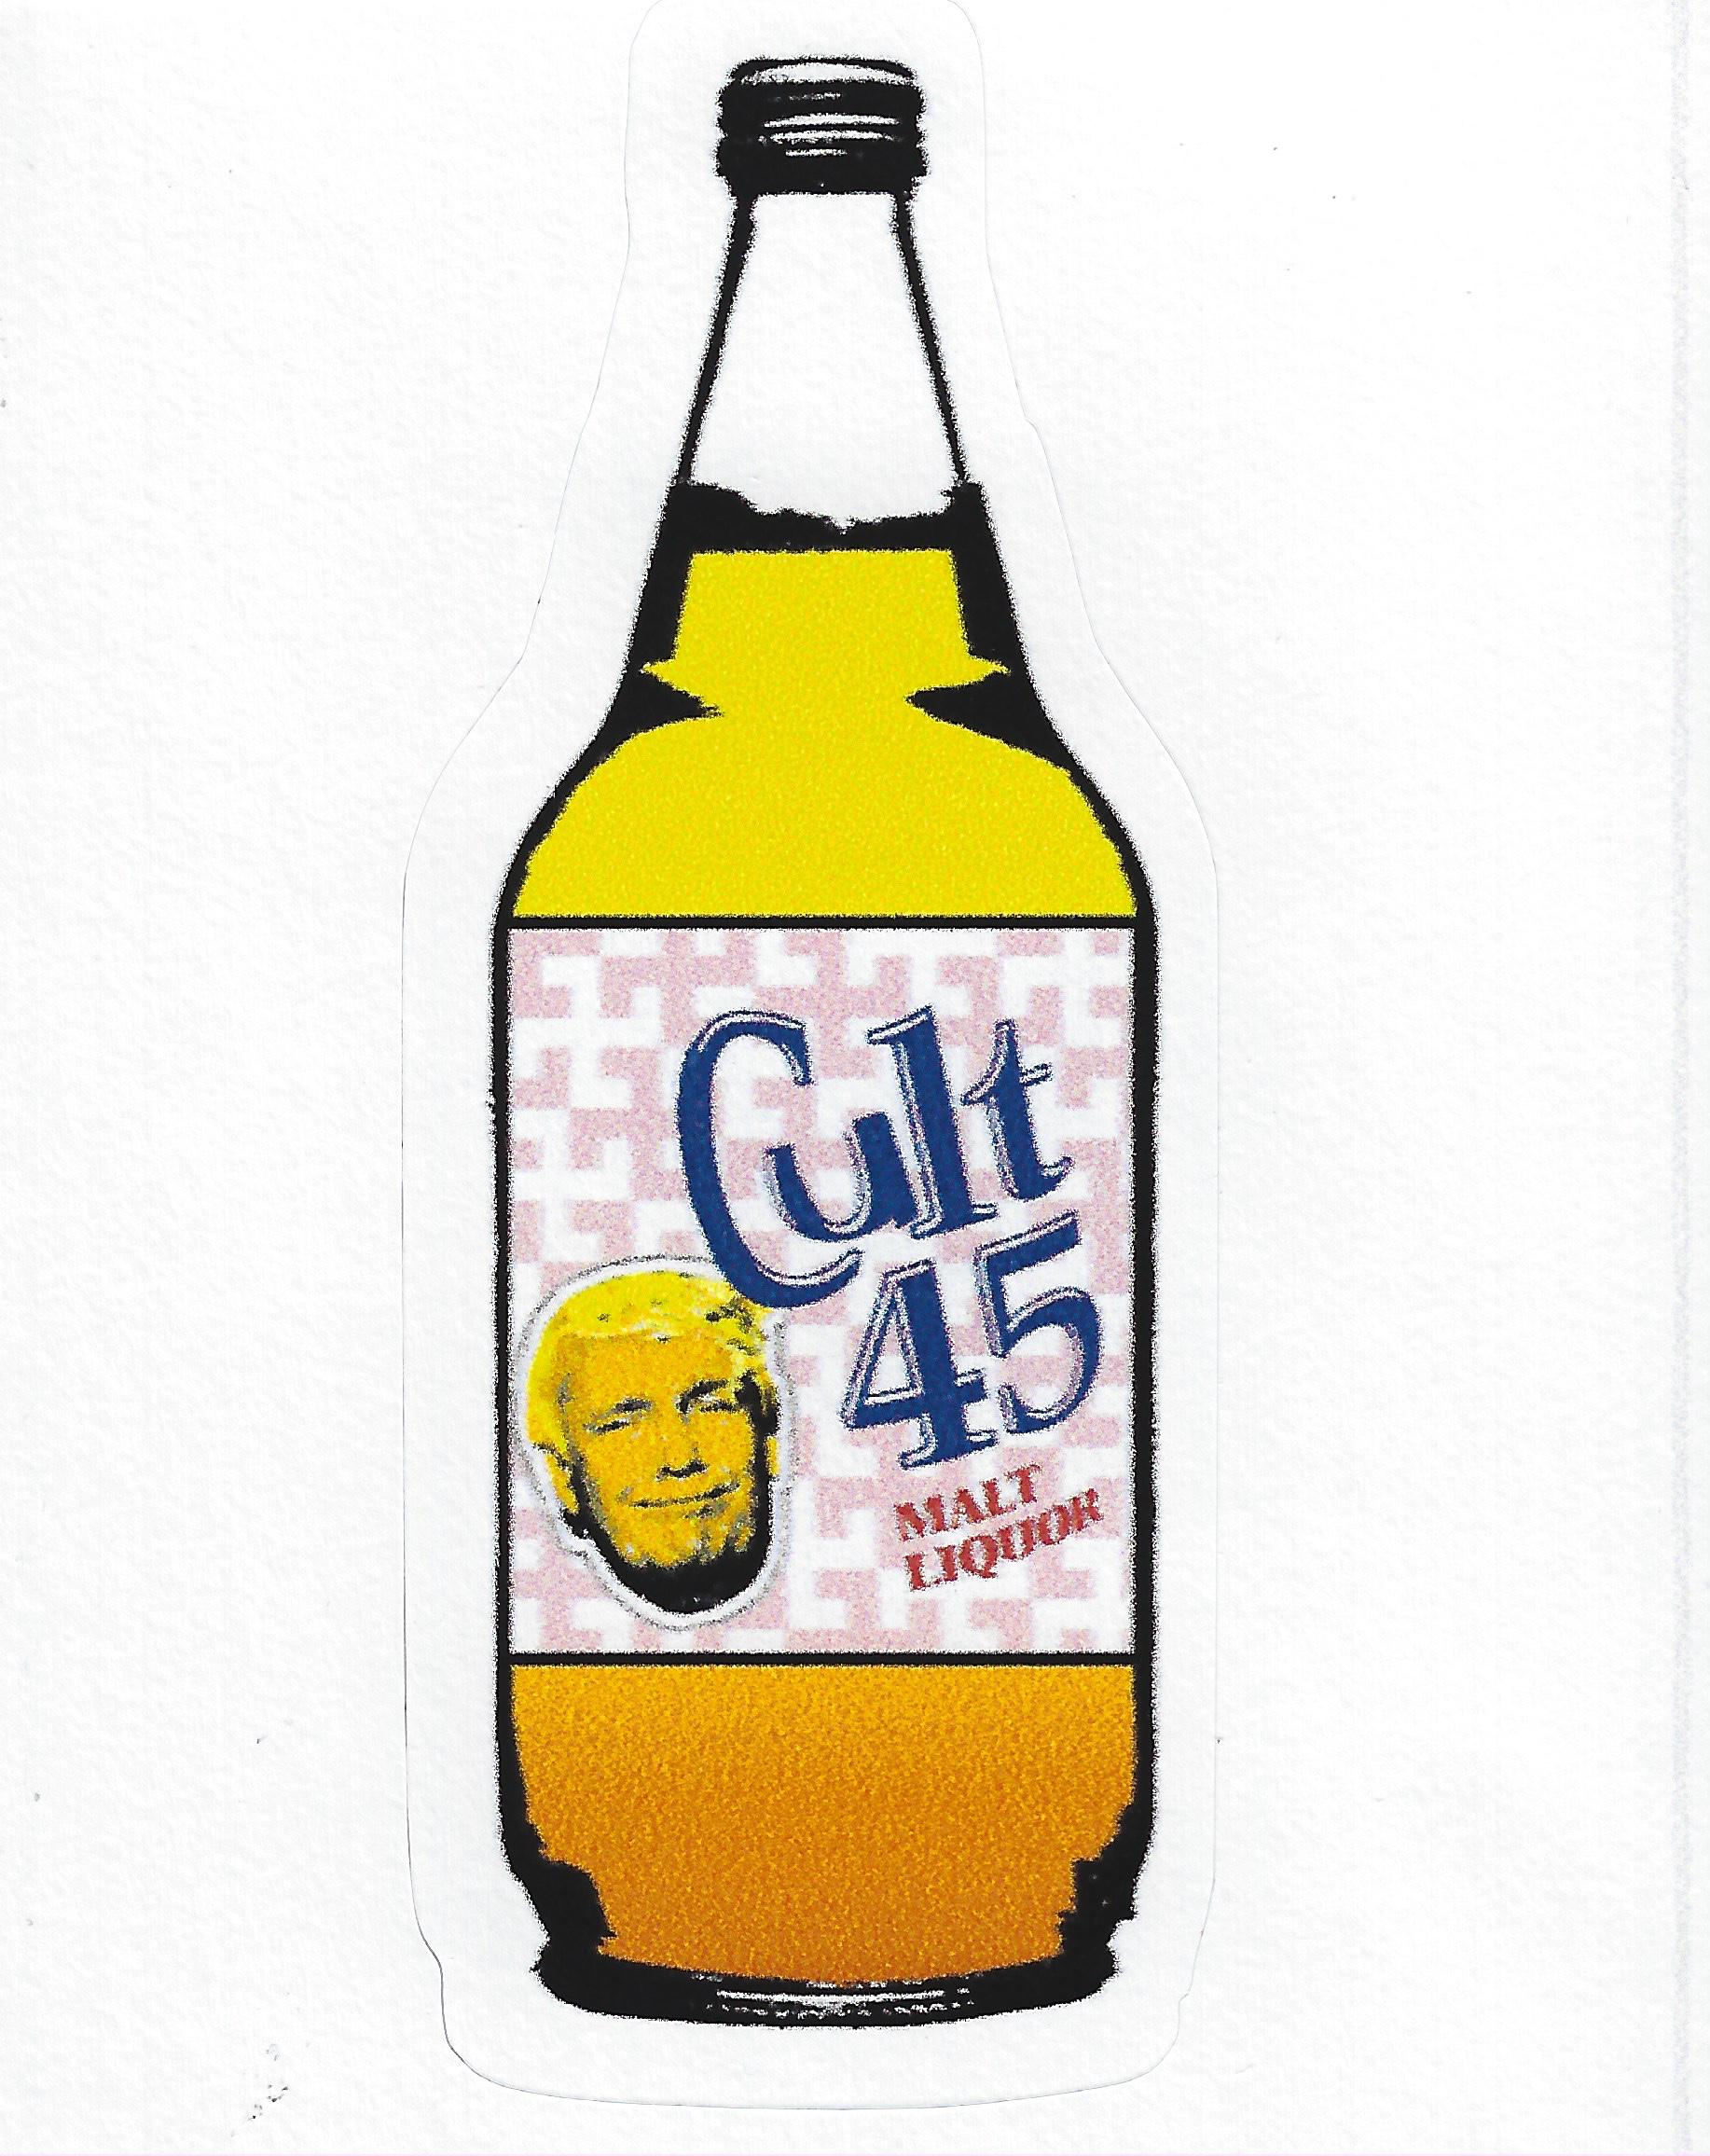 Cult 45 Malt Liquor